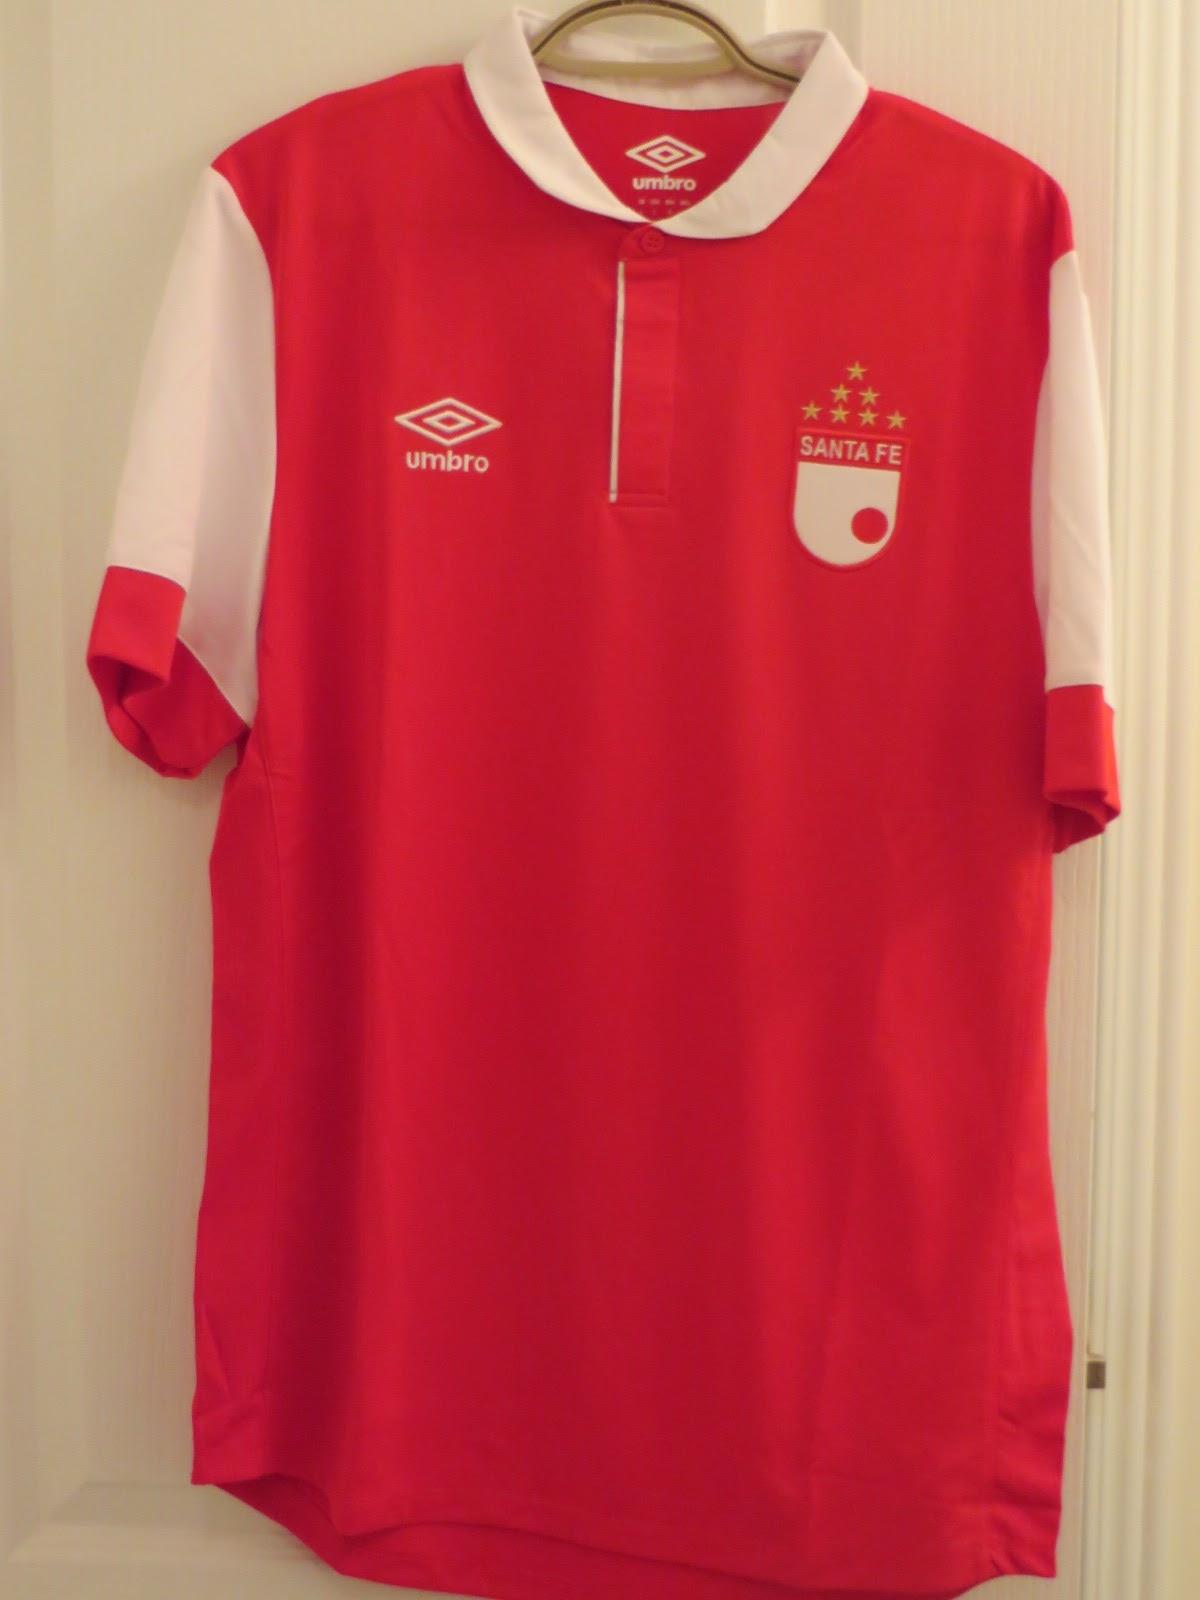 My Umbro Football Jerseys Collection  Independiente Santa Fe 2014 ... 44a964498